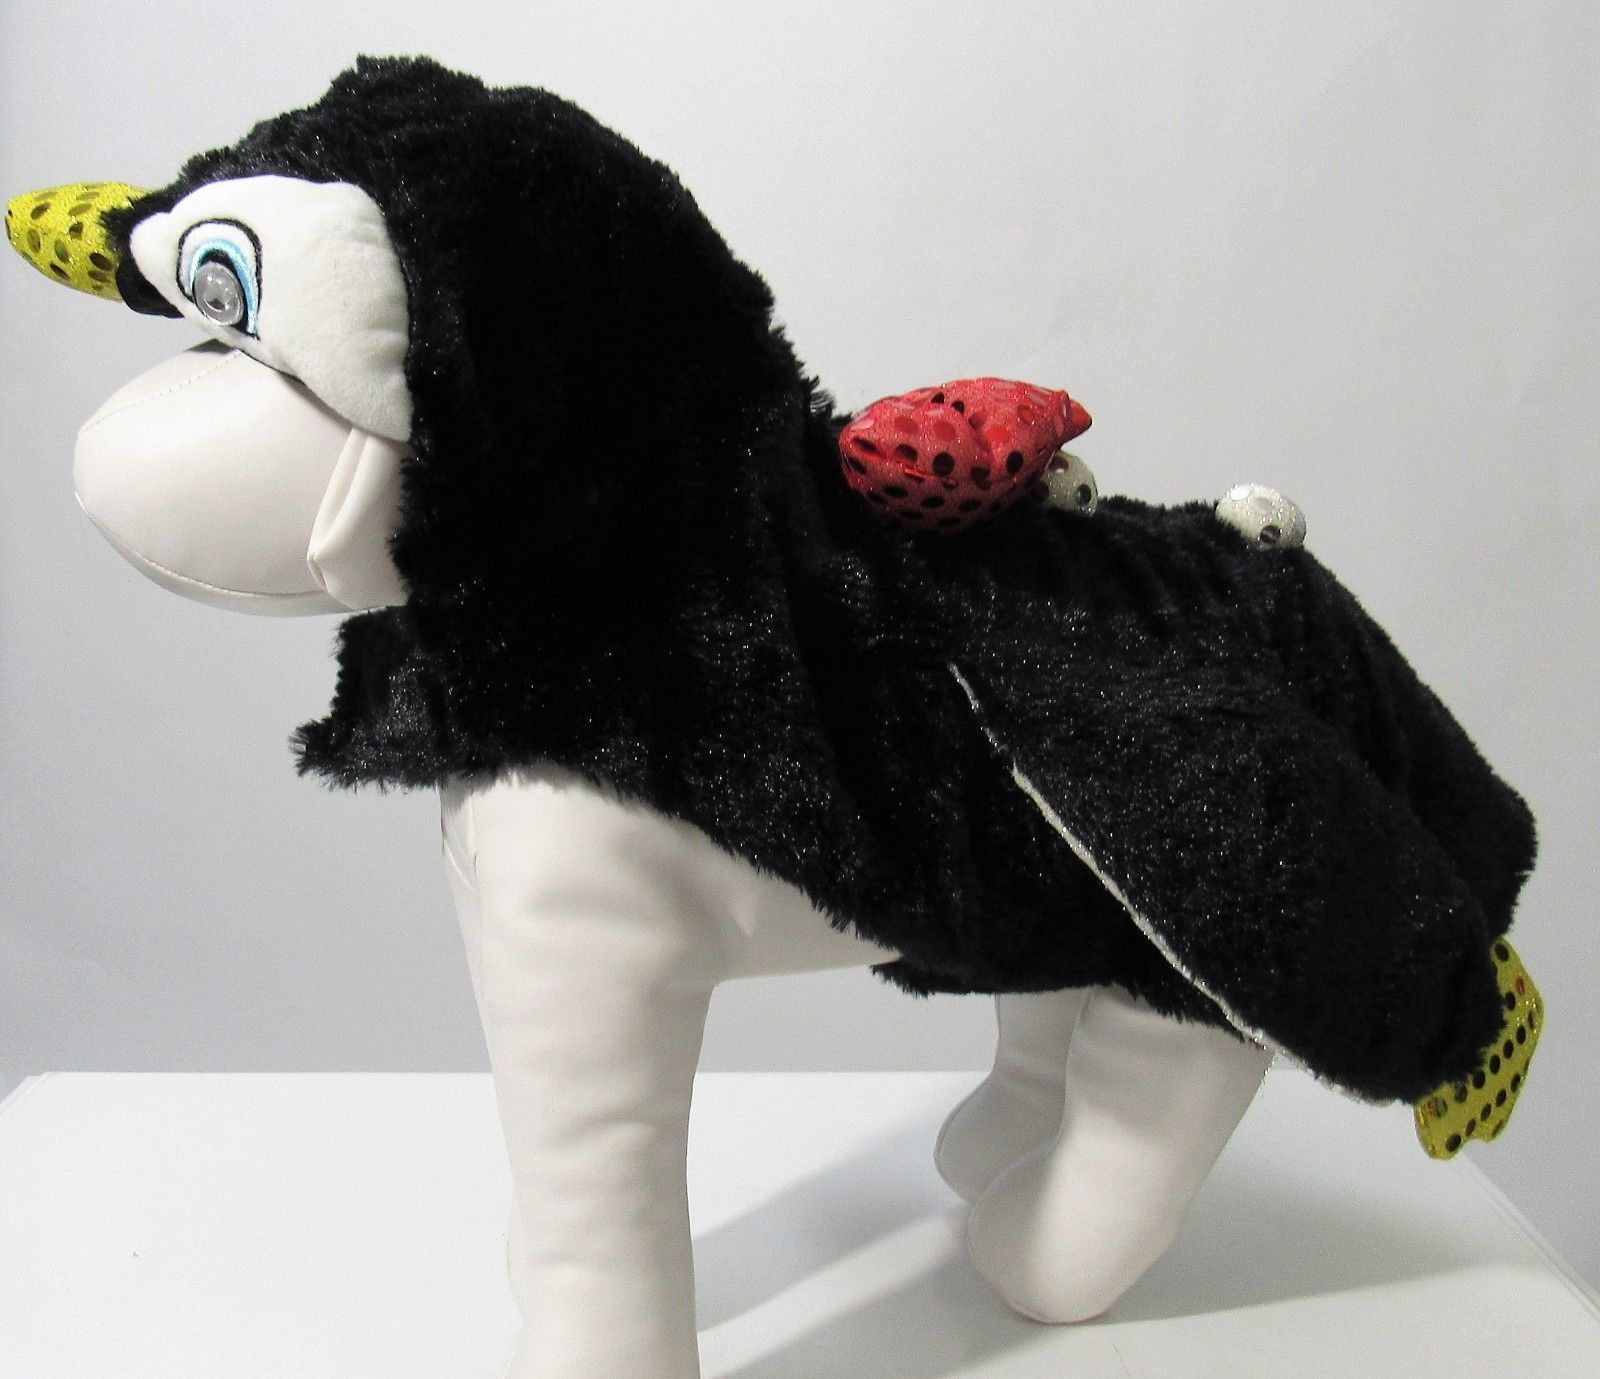 Pet Sequin Penguin Light Up Eyes Costume Sz S, M & L NEW